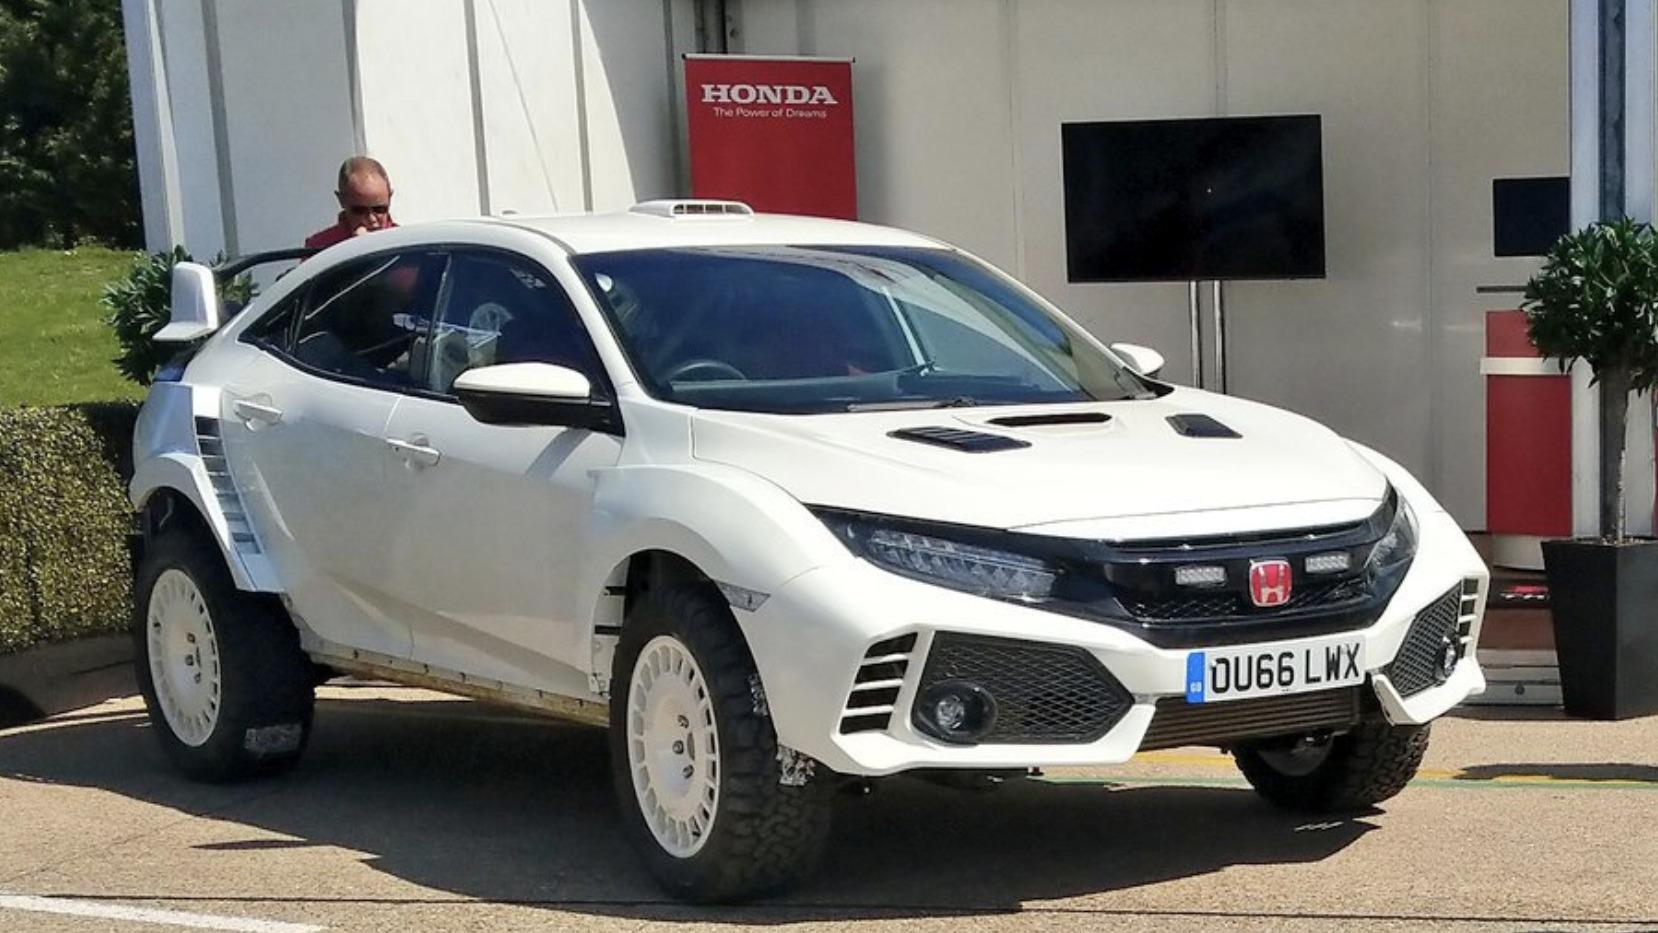 Honda-Civic-Type-R-rally-car-1